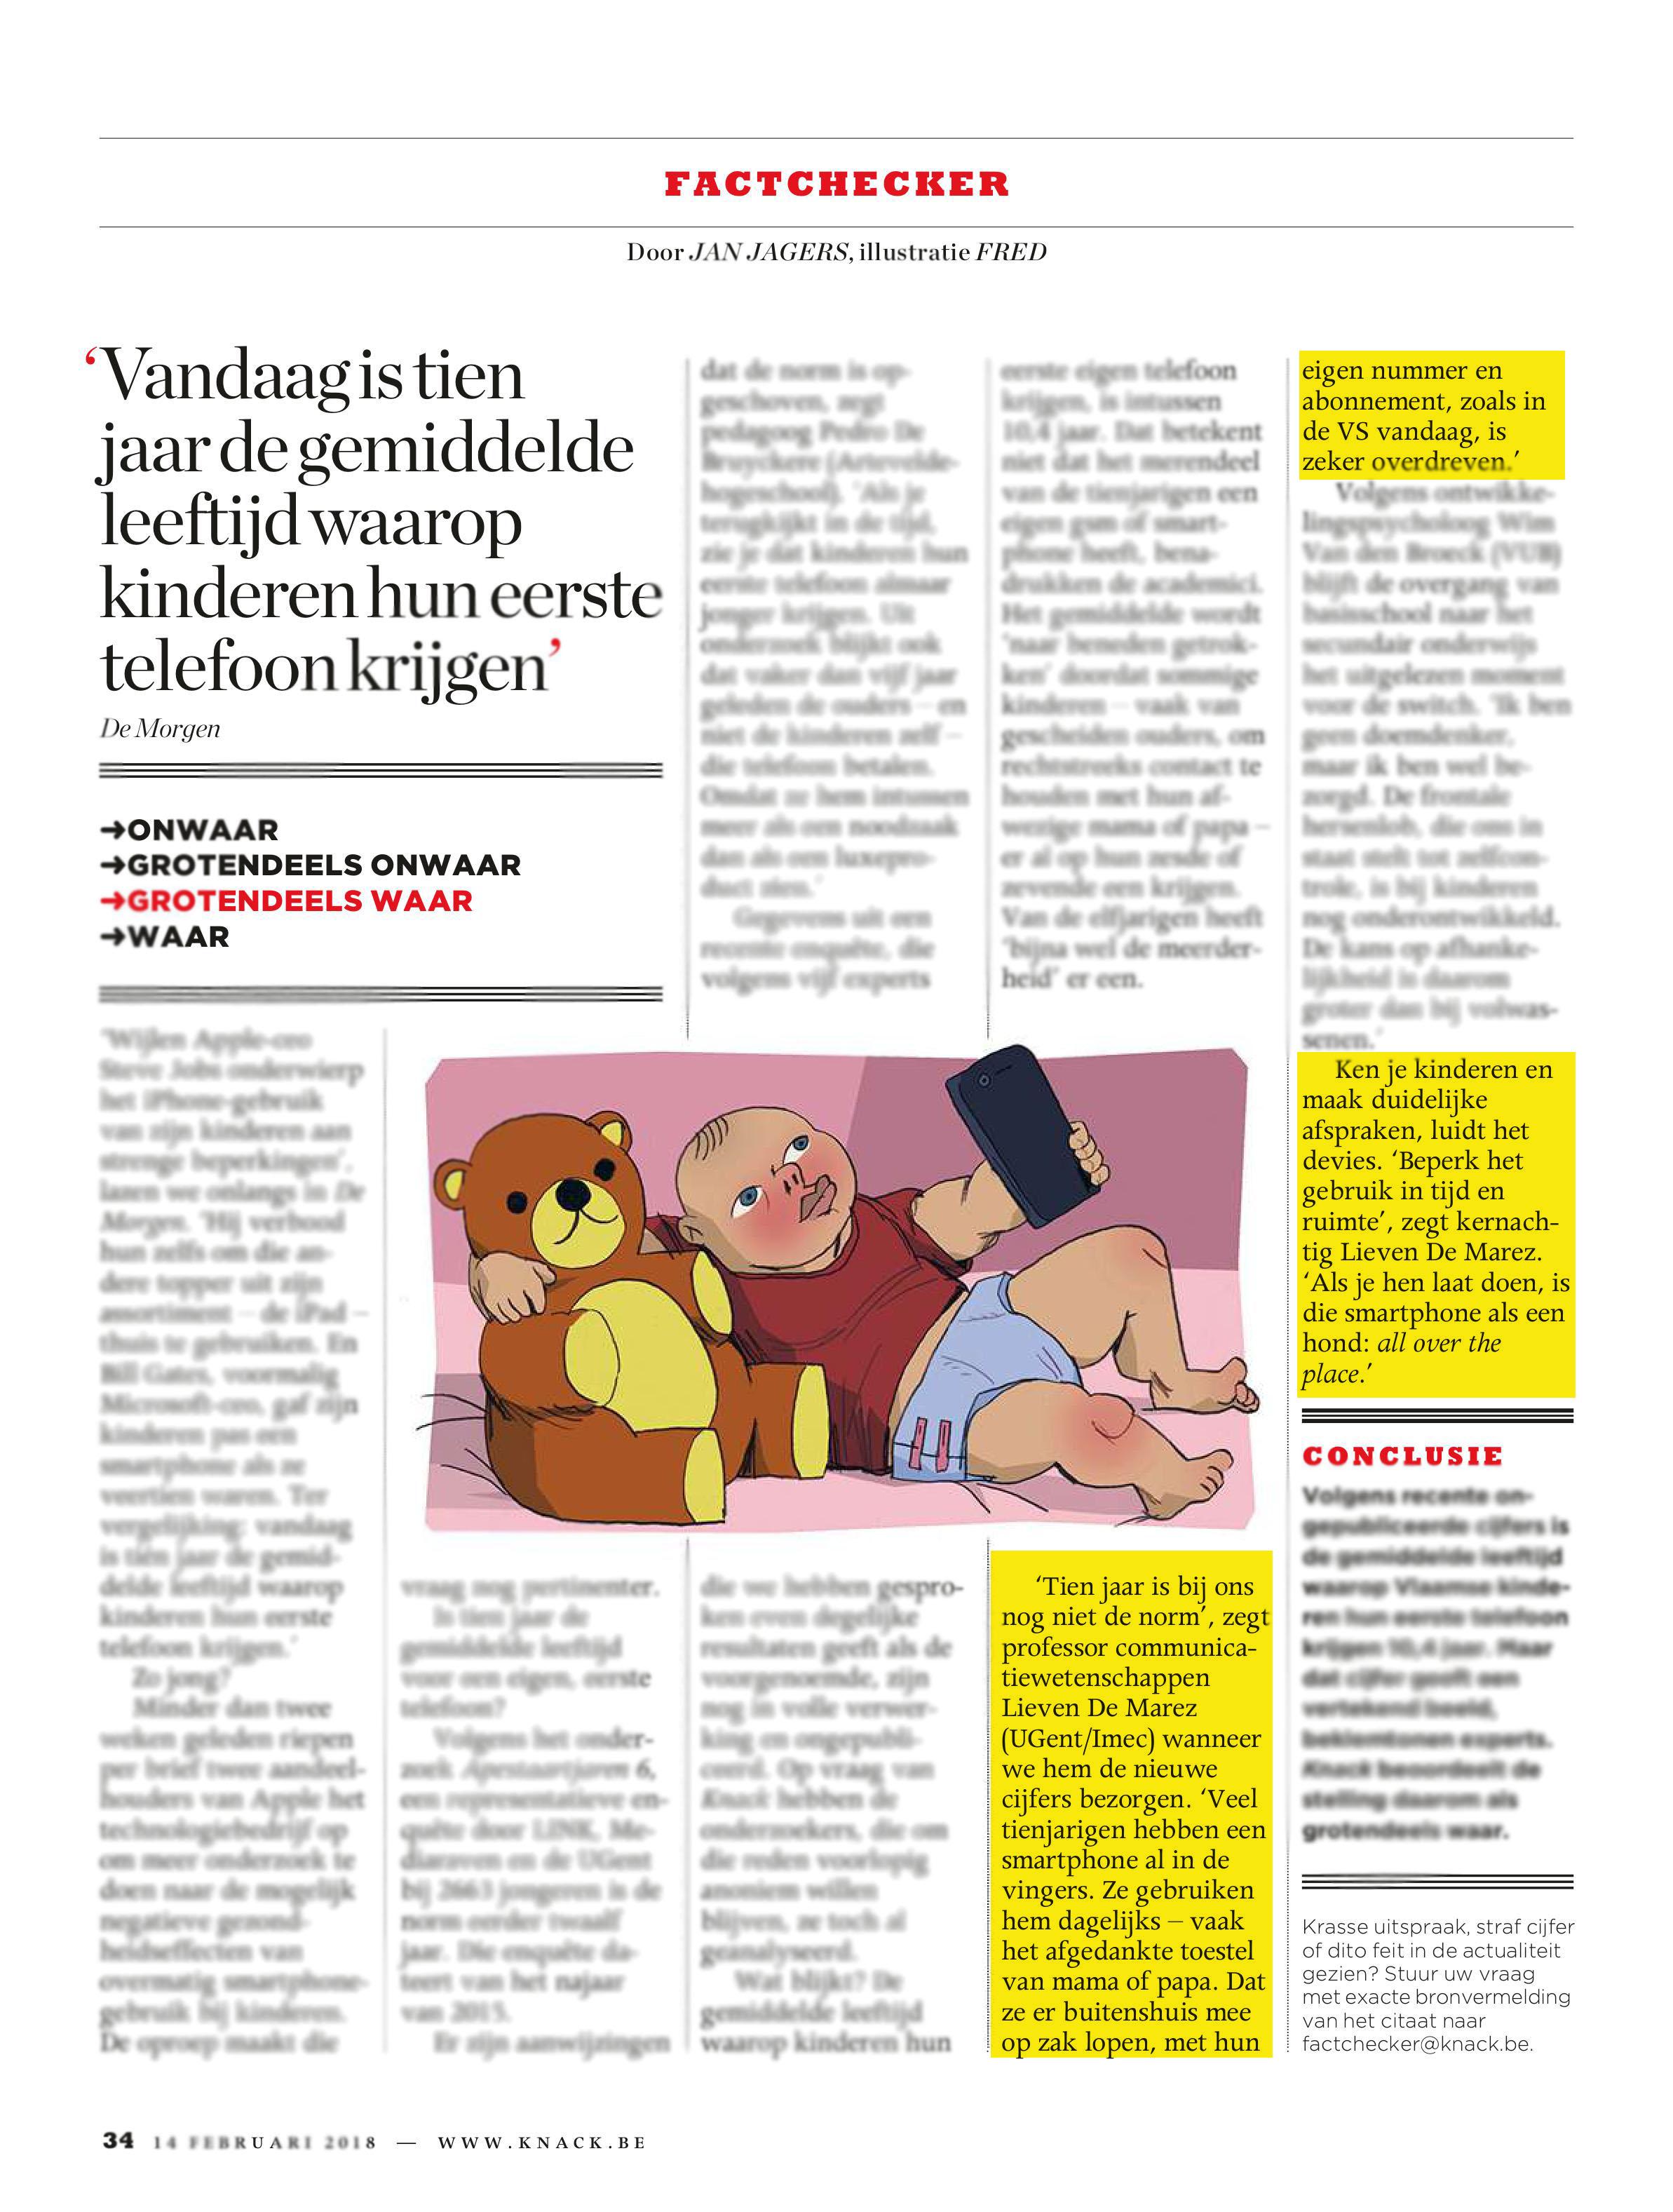 BRON: Knack, 14/02/2018, p 34